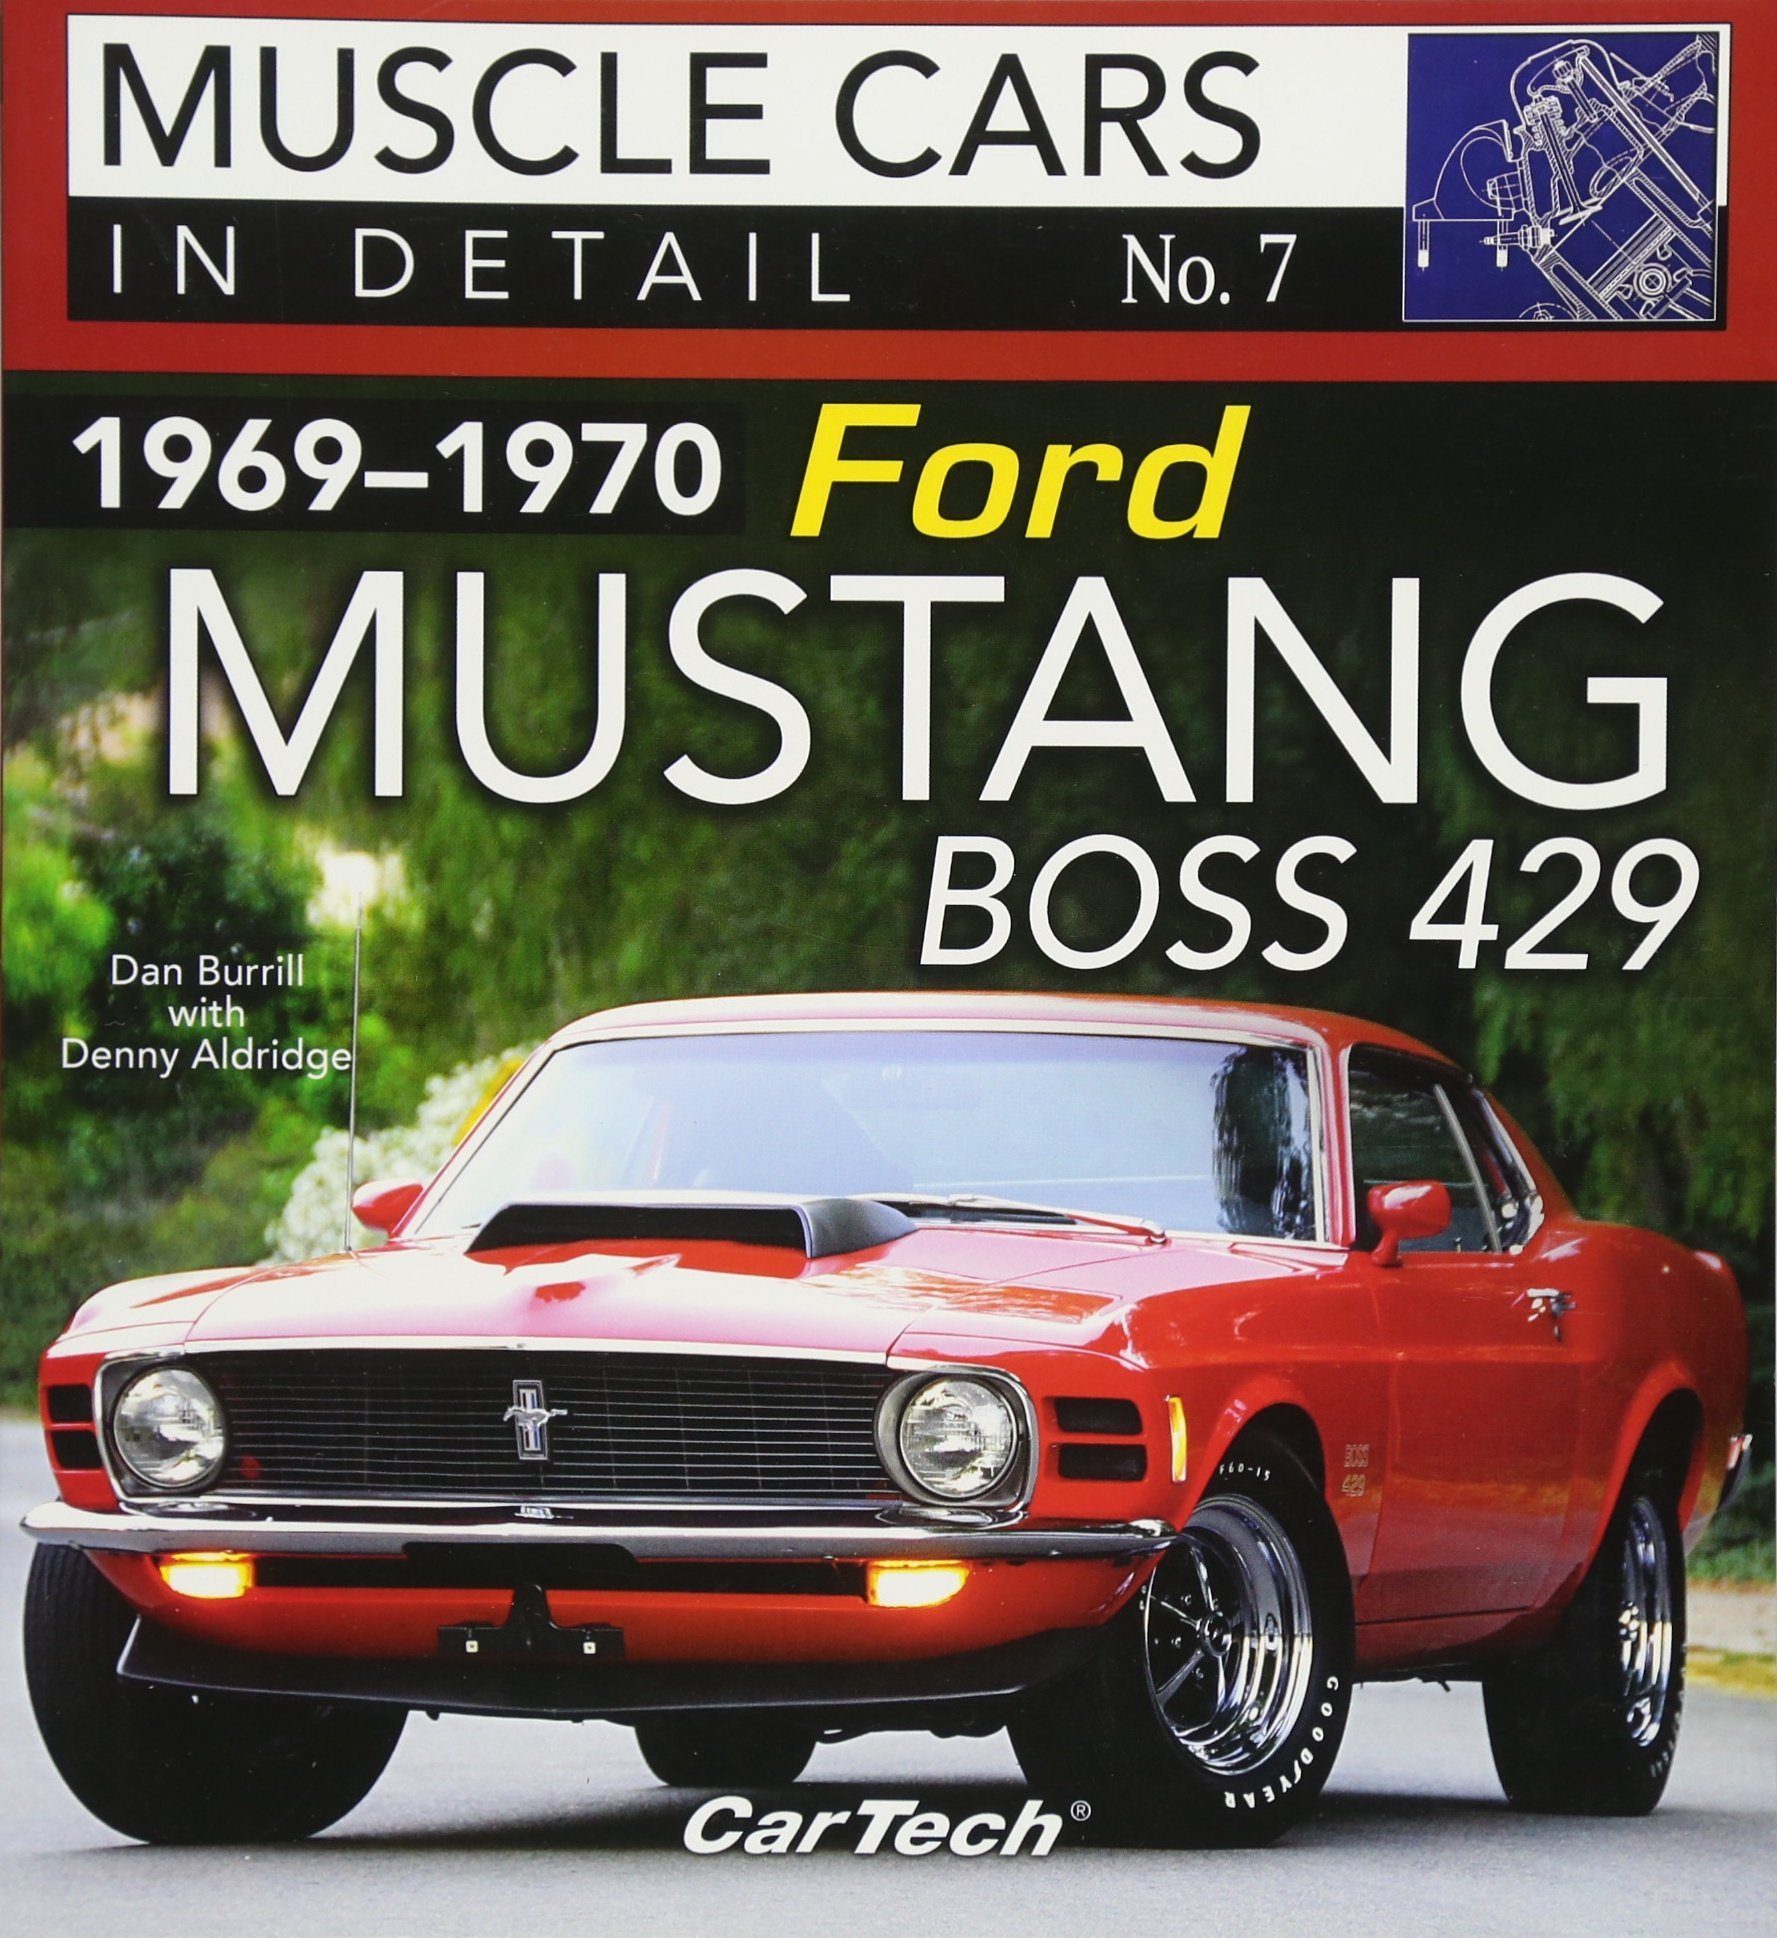 1969-1970 Ford Mustang Boss 429: Muscle Cars In Detail No. 7: Dan Burrill,  Denny Aldridge: 9781613253168: Amazon.com: Books